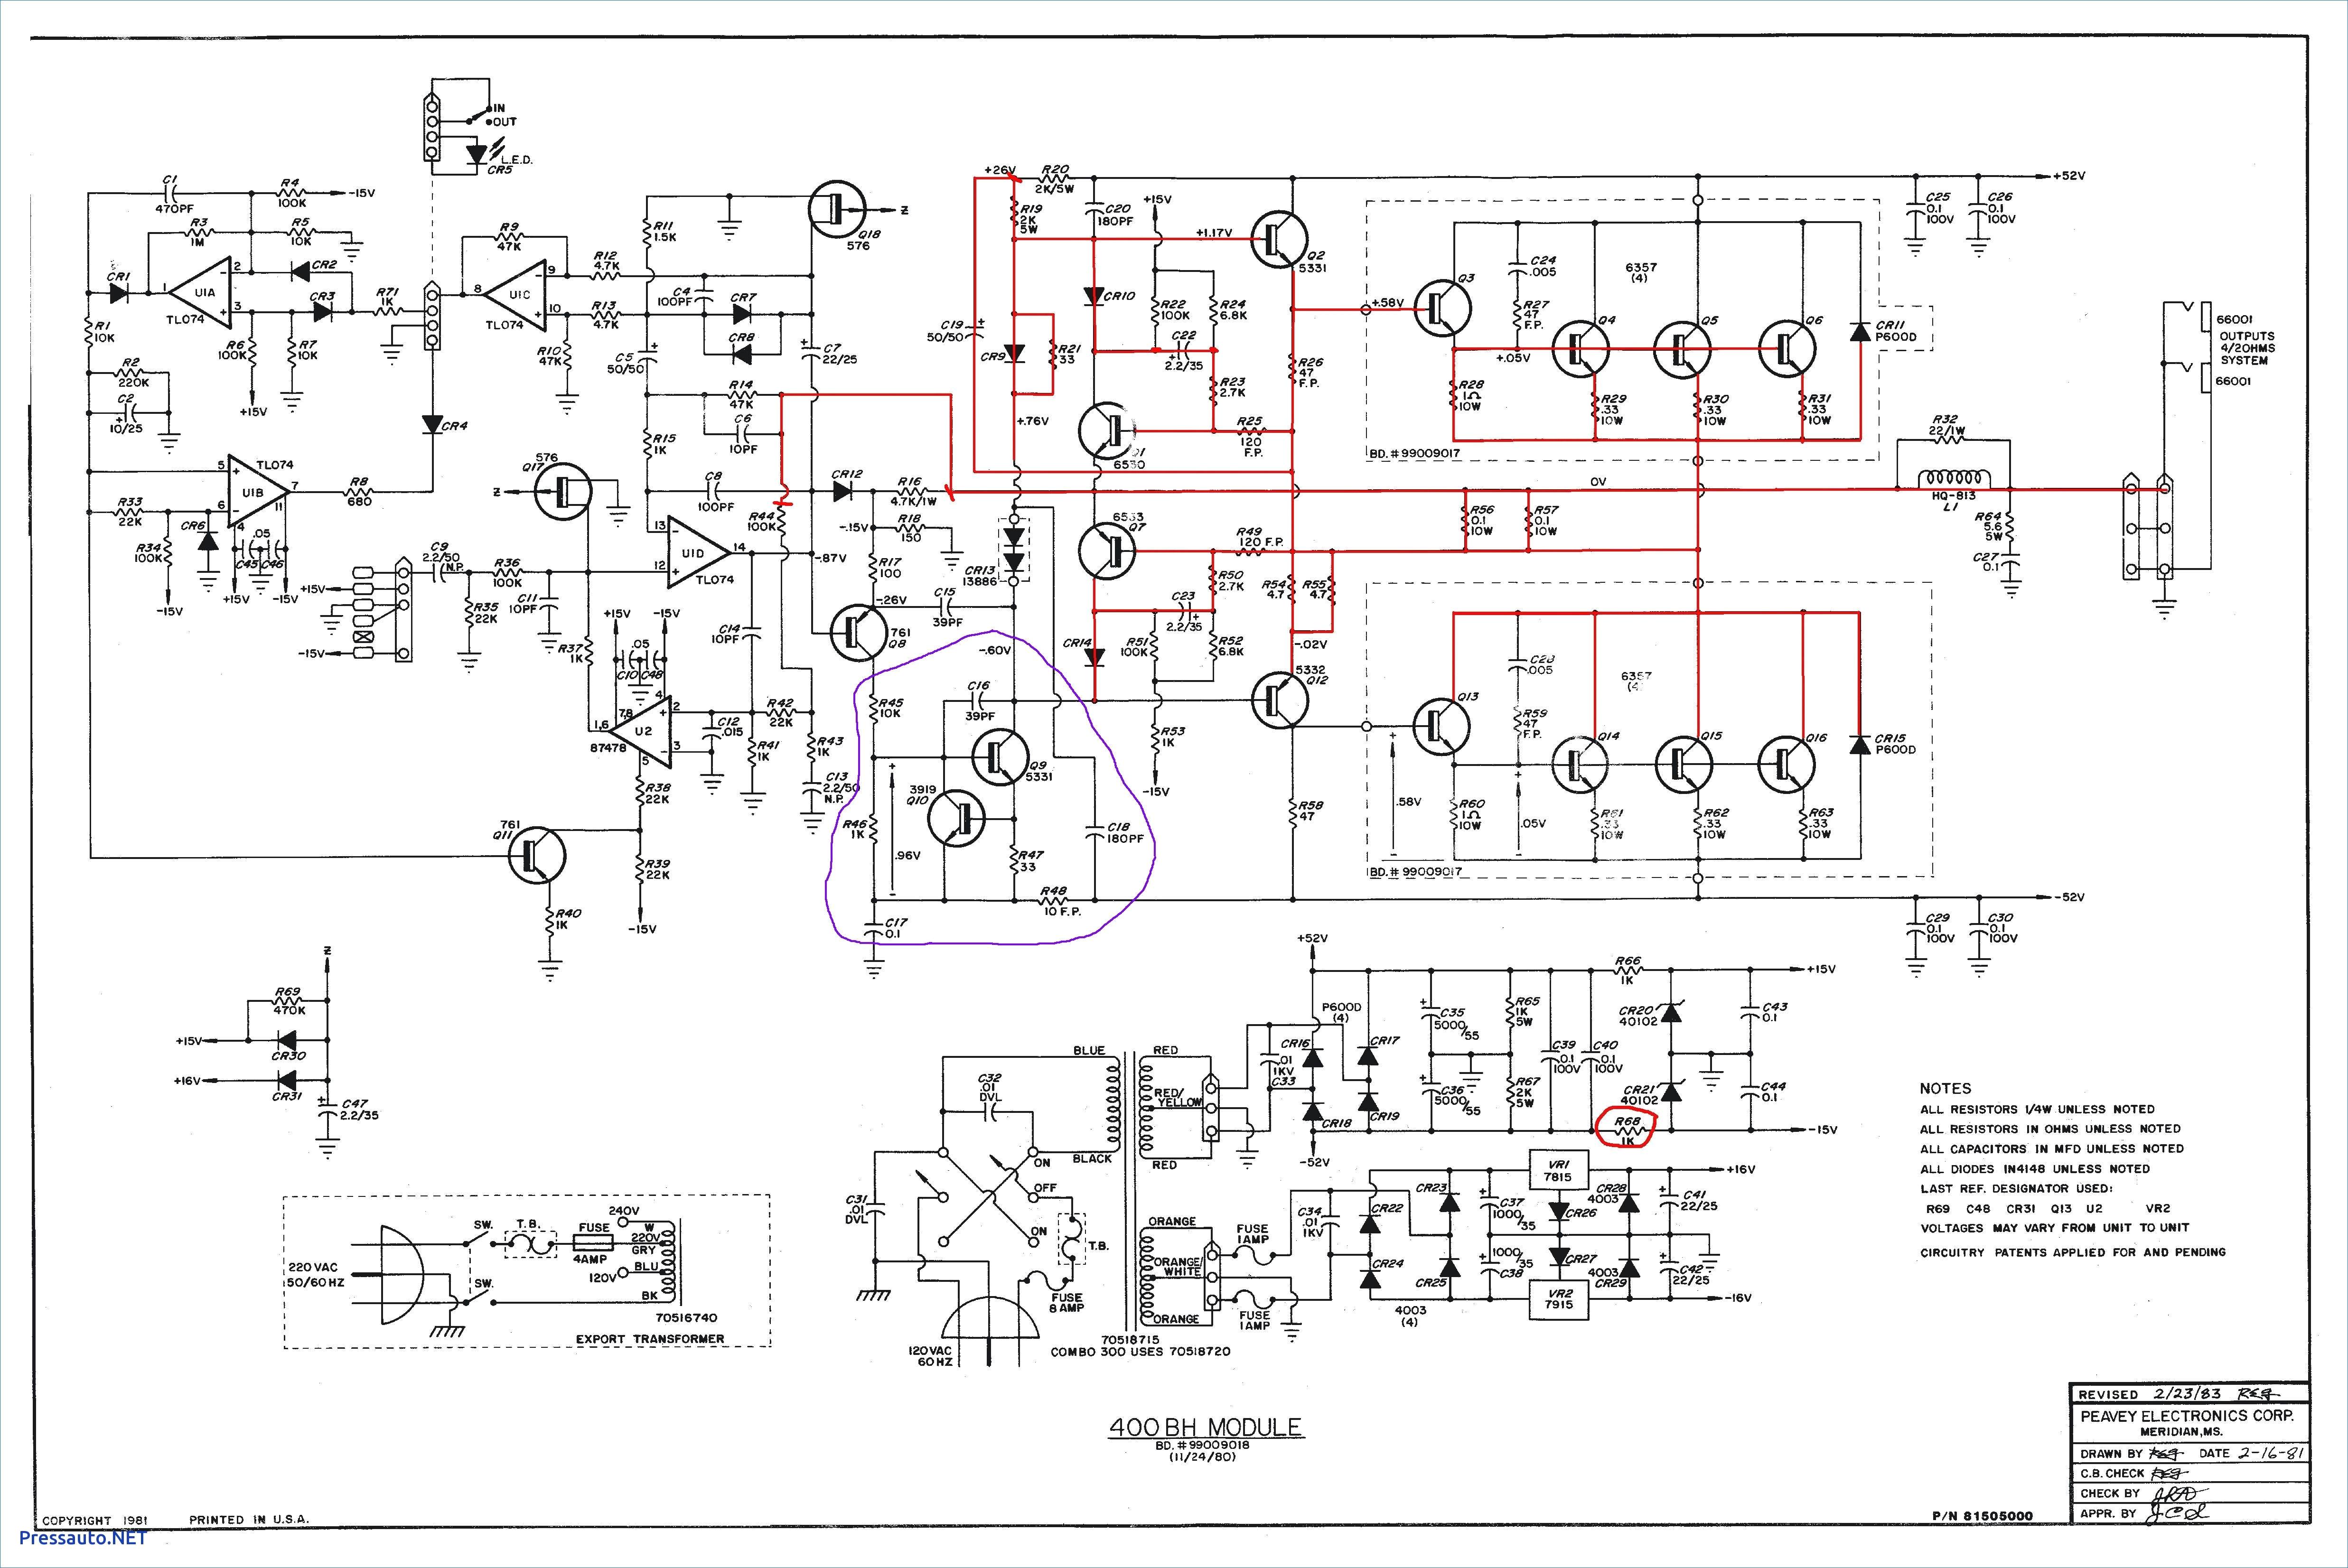 Megapro Videoke Remote Wiring Diagram